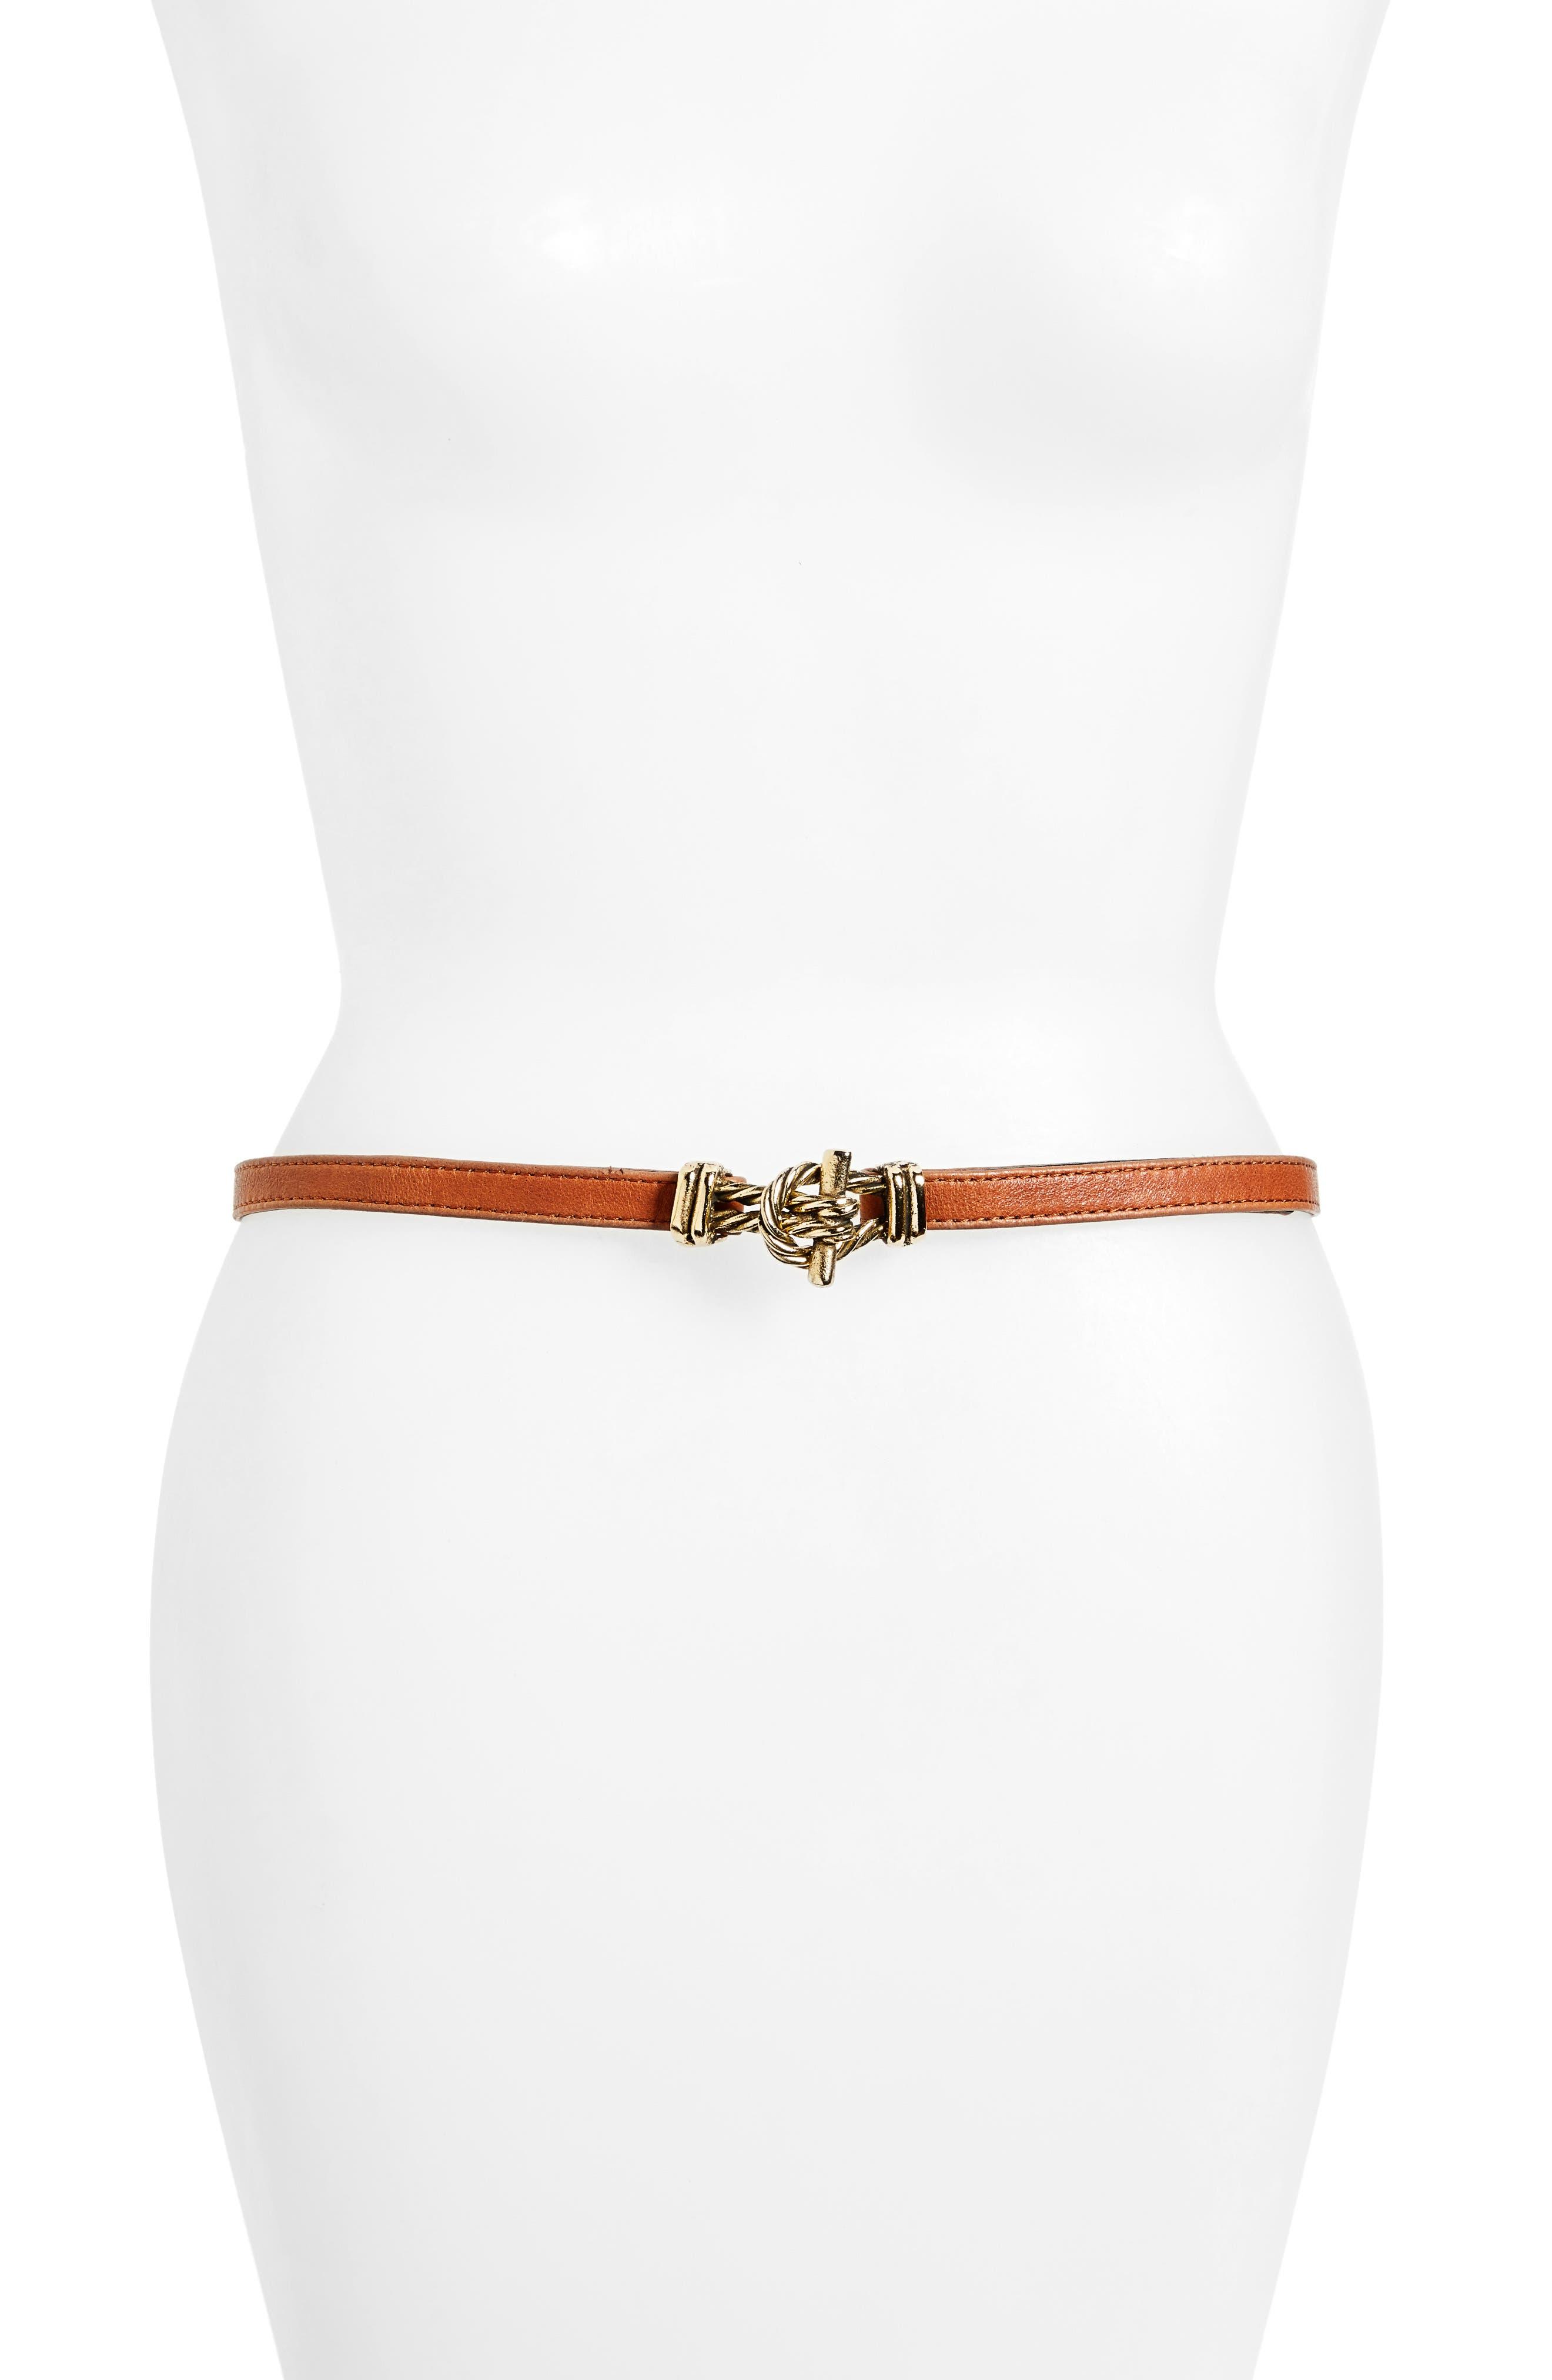 RAINA Fitzgerald Leather Belt, Main, color, COGNAC